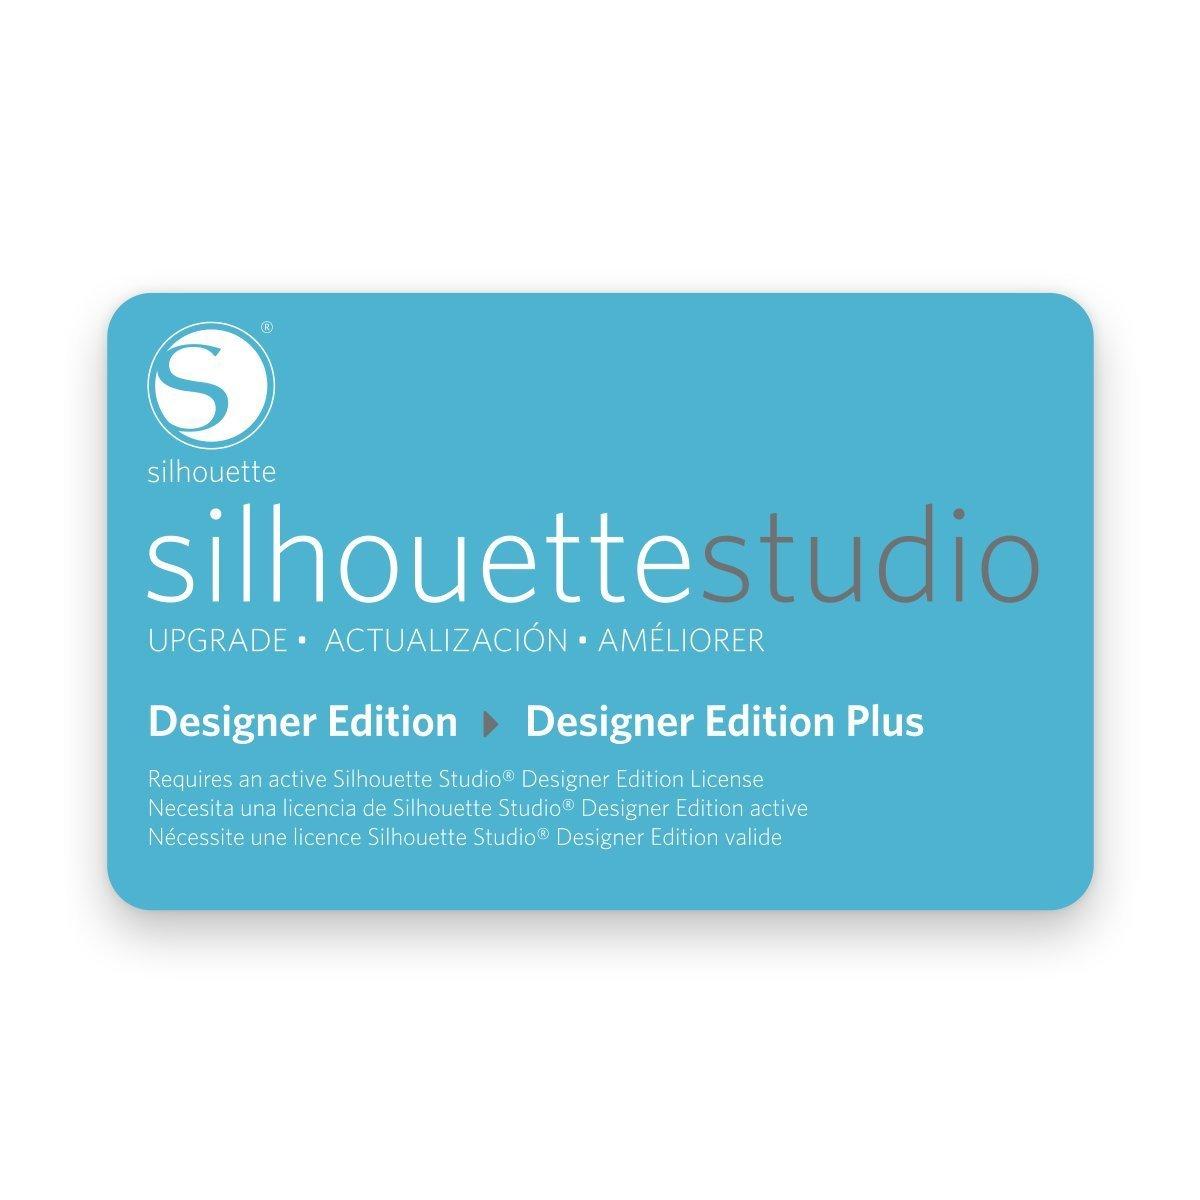 Silhouette Studio Vs Silhouette Studio Designer Edition